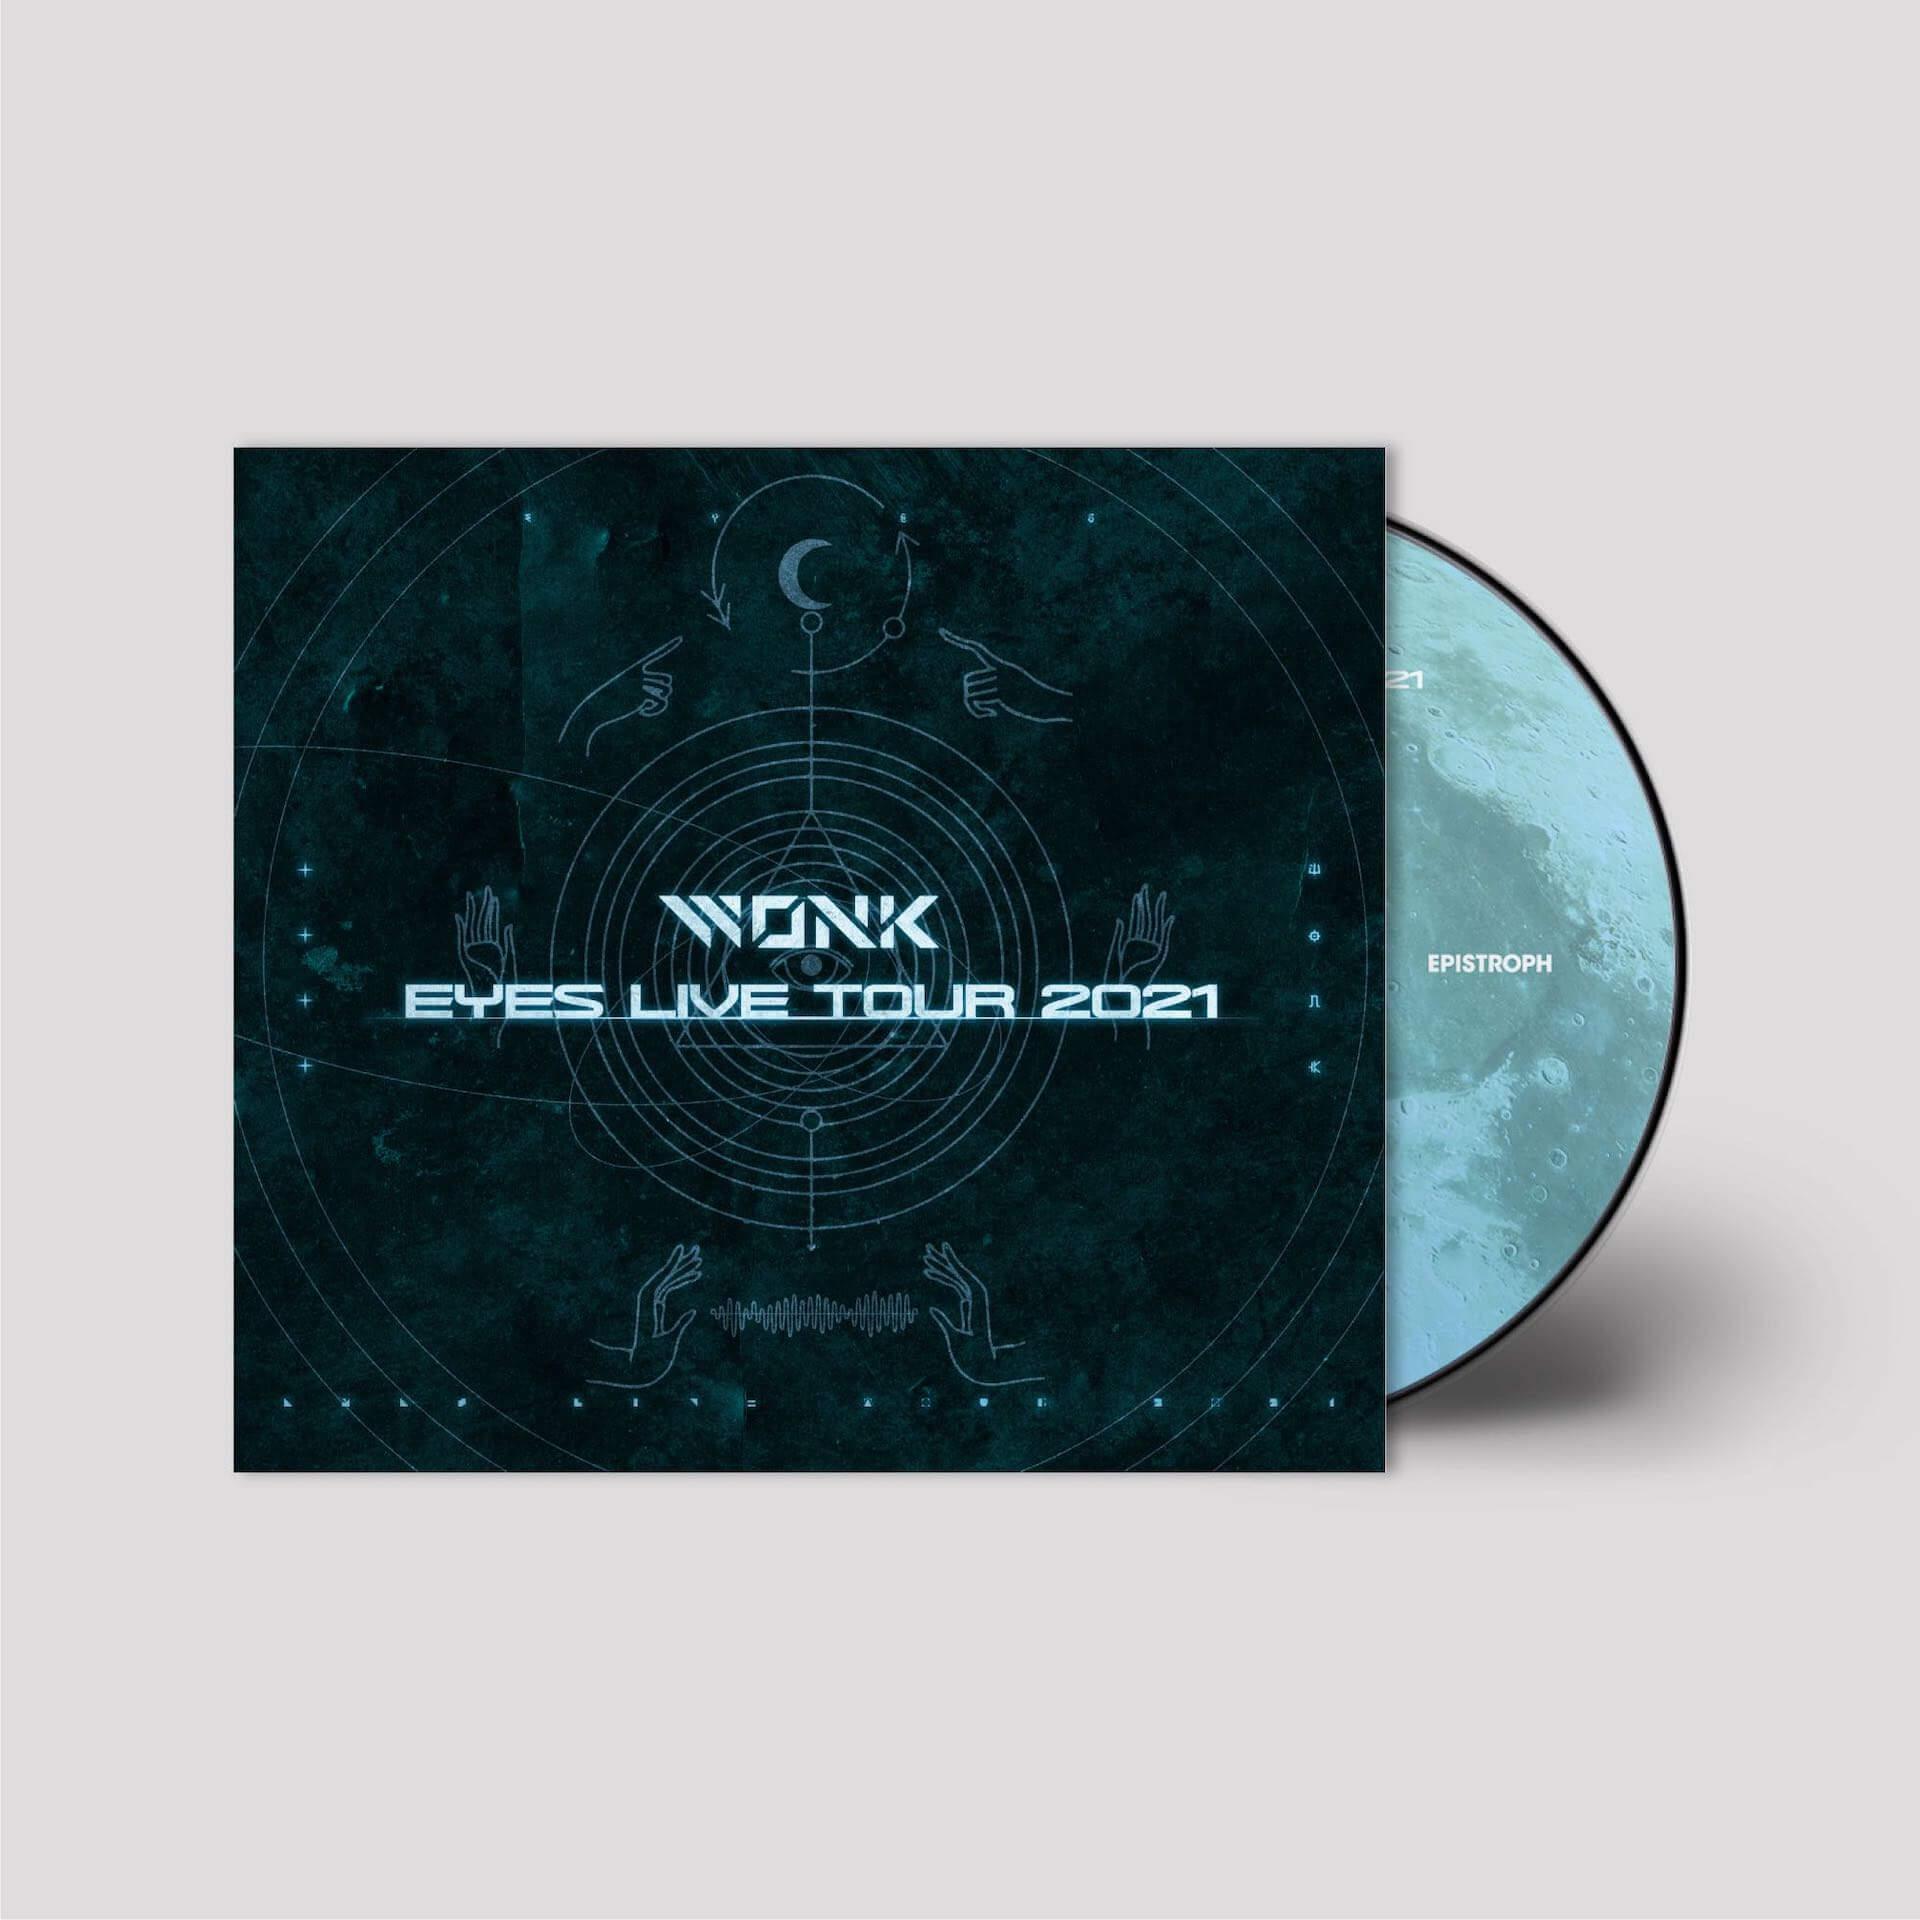 WONK『EYES』のリミックスシリーズが配信決定!坂東祐大、Oscar Jerome、Charlie Limが参加 music210609_wonk_remix_2